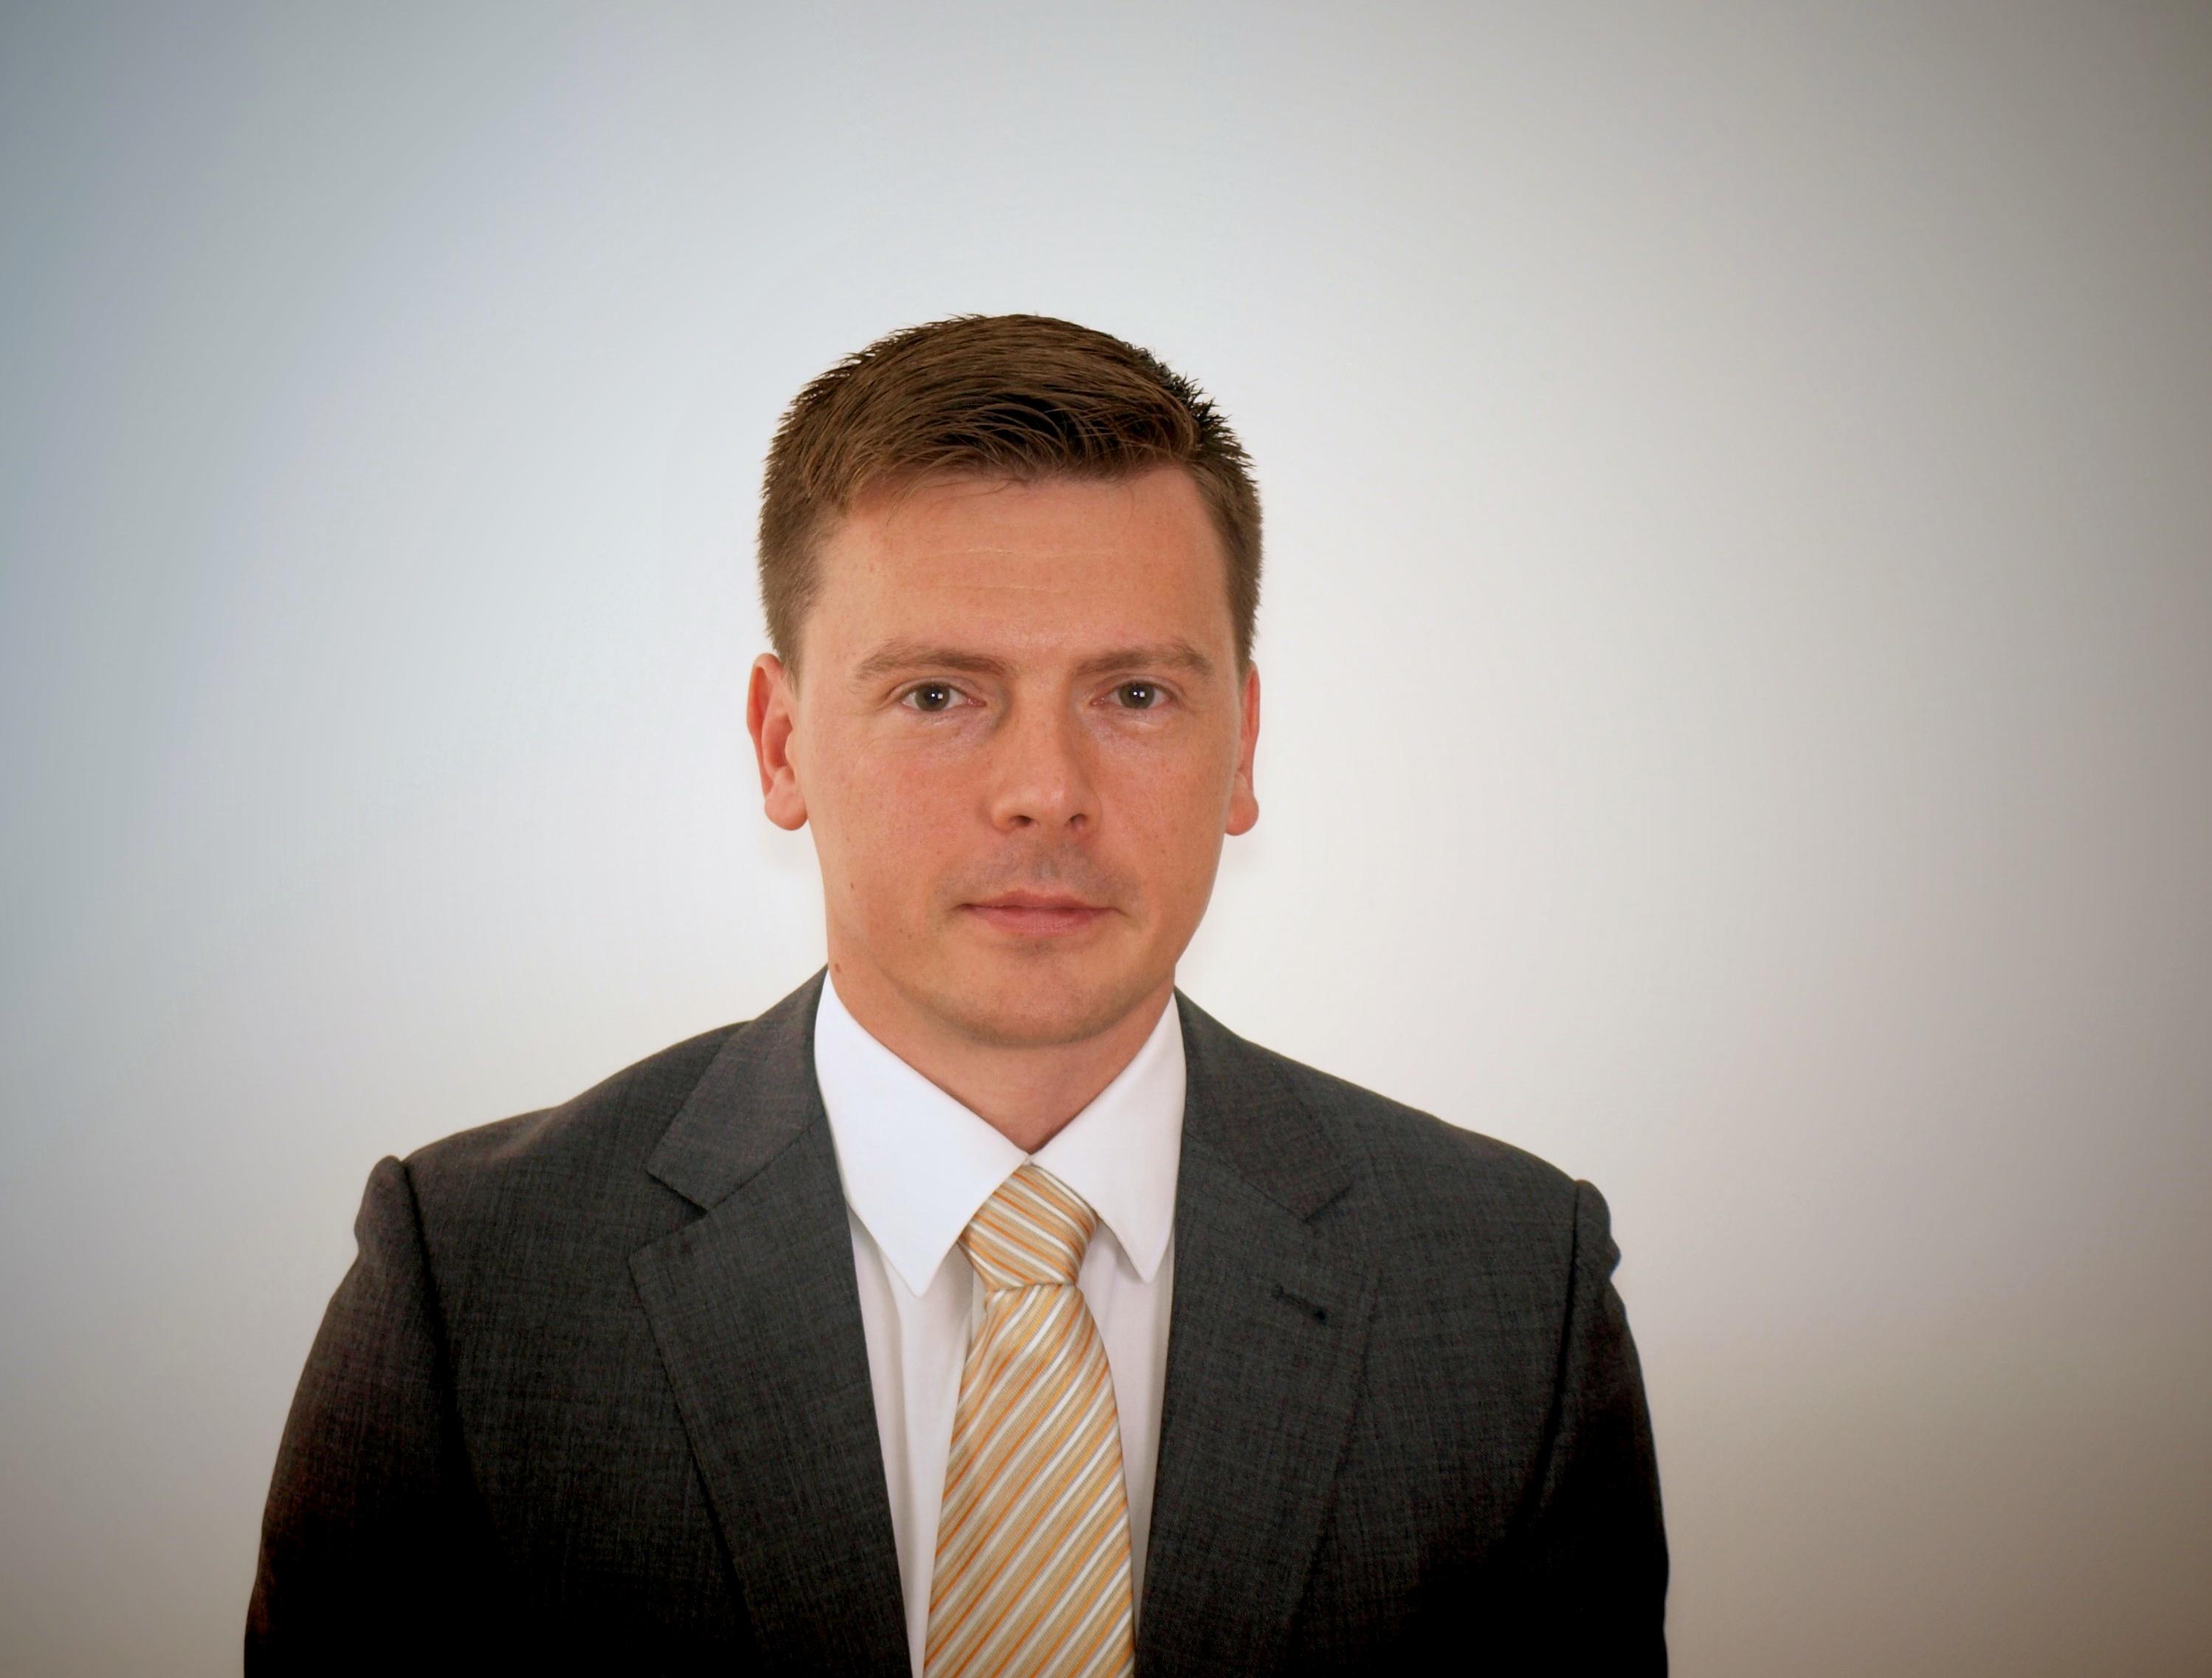 Dmitri Jegorov. Foto erakogu